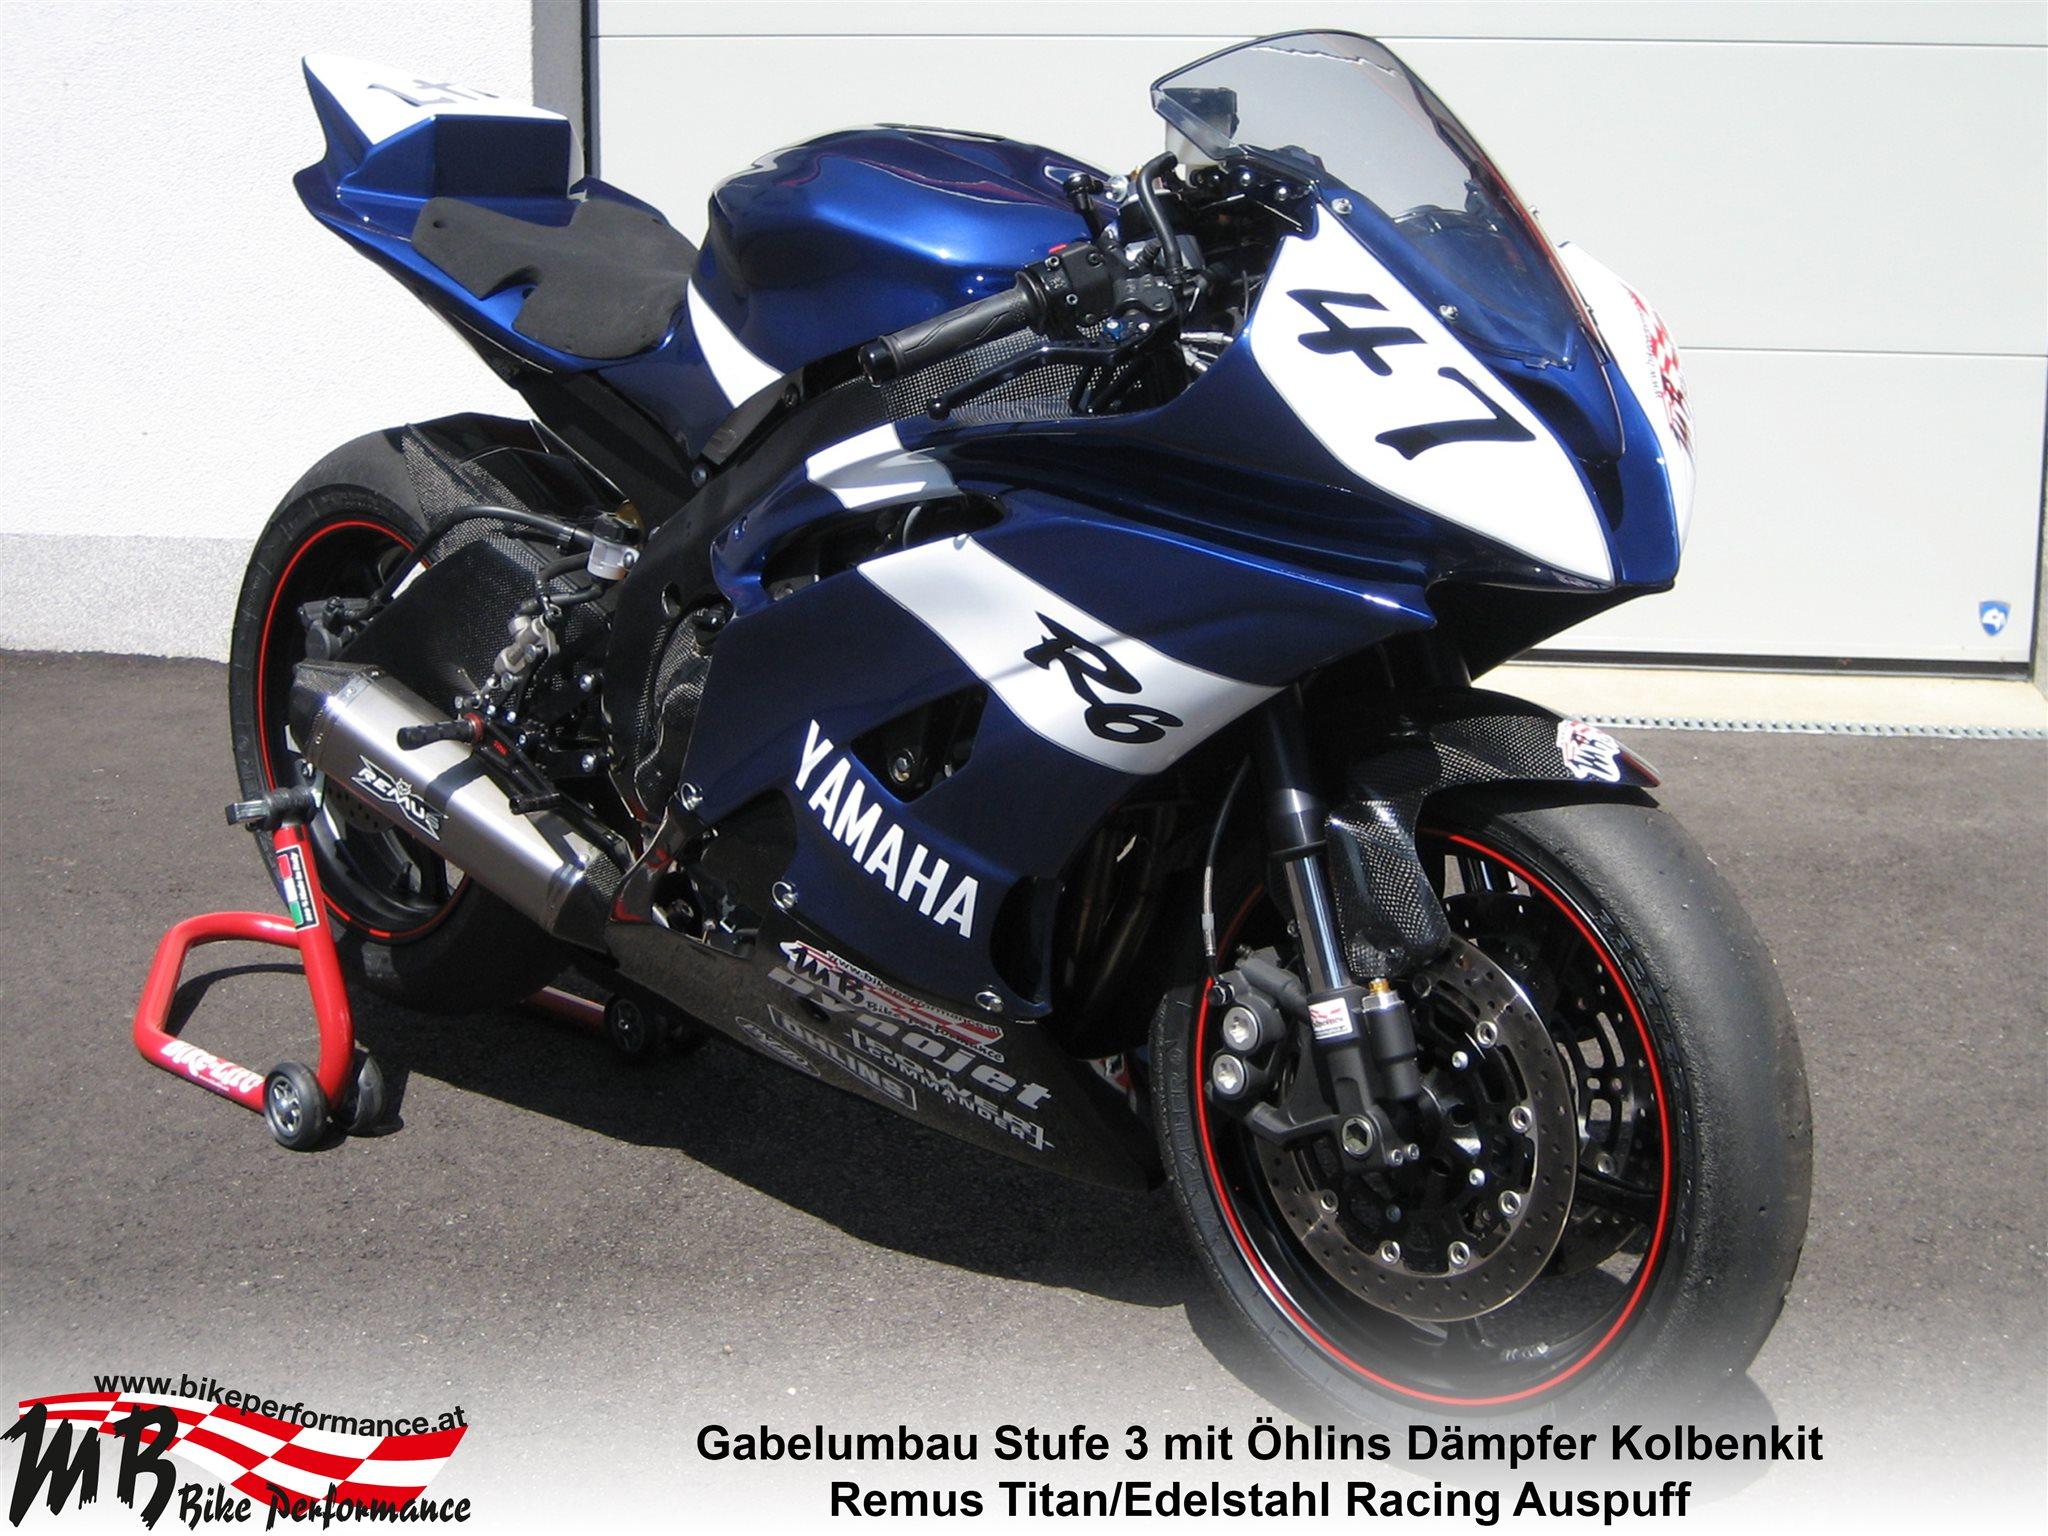 umgebautes motorrad yamaha yzf r6 von mb bike performance gmbh. Black Bedroom Furniture Sets. Home Design Ideas